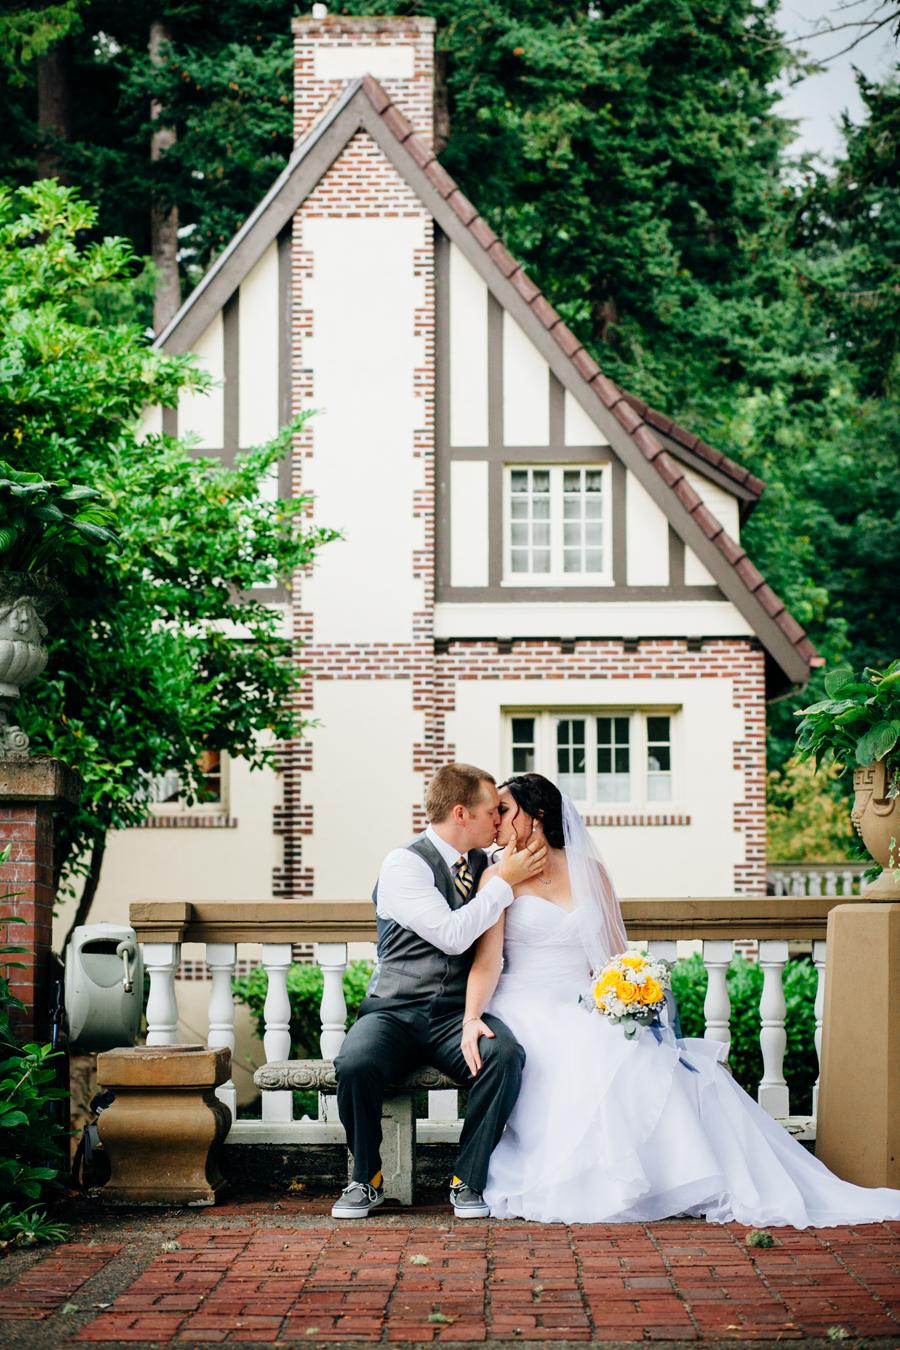 025-lairmont-manor-bellingham-washington-wedding-katheryn-moran-photography.jpg